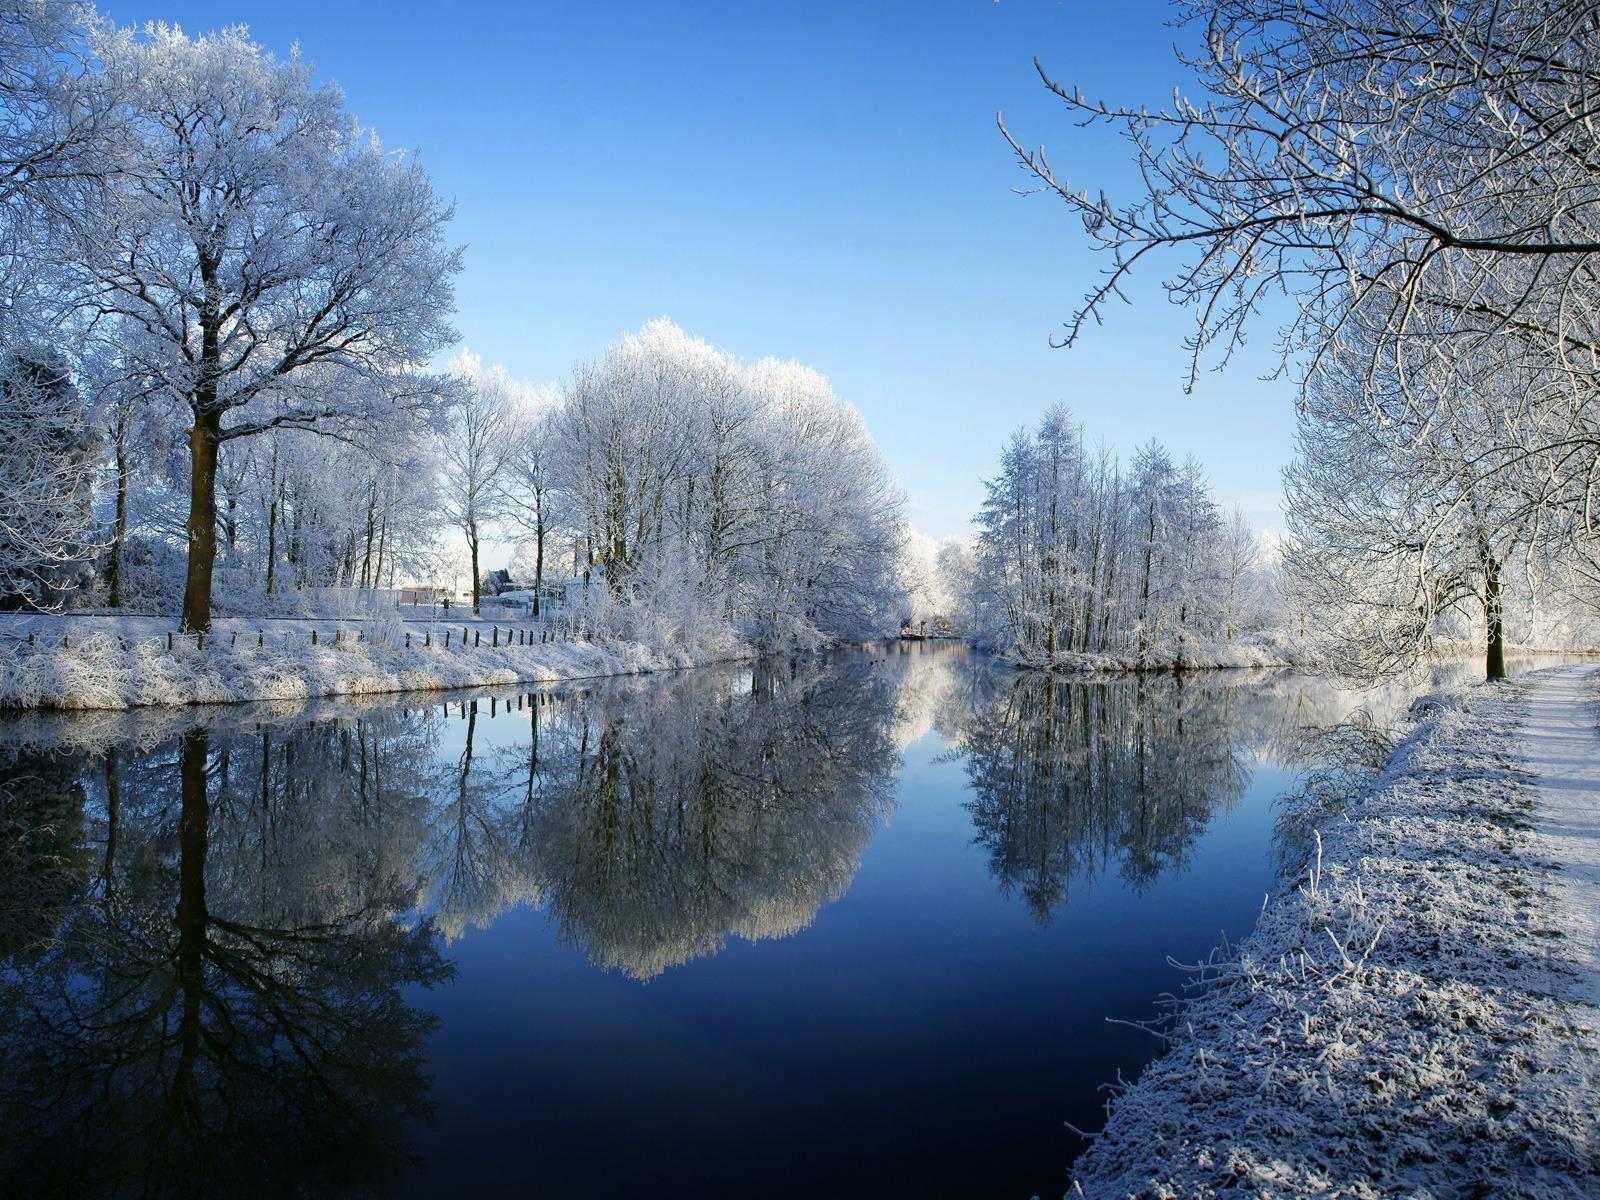 kromme rijn wallpaper winter nature wallpapers in jpg format for